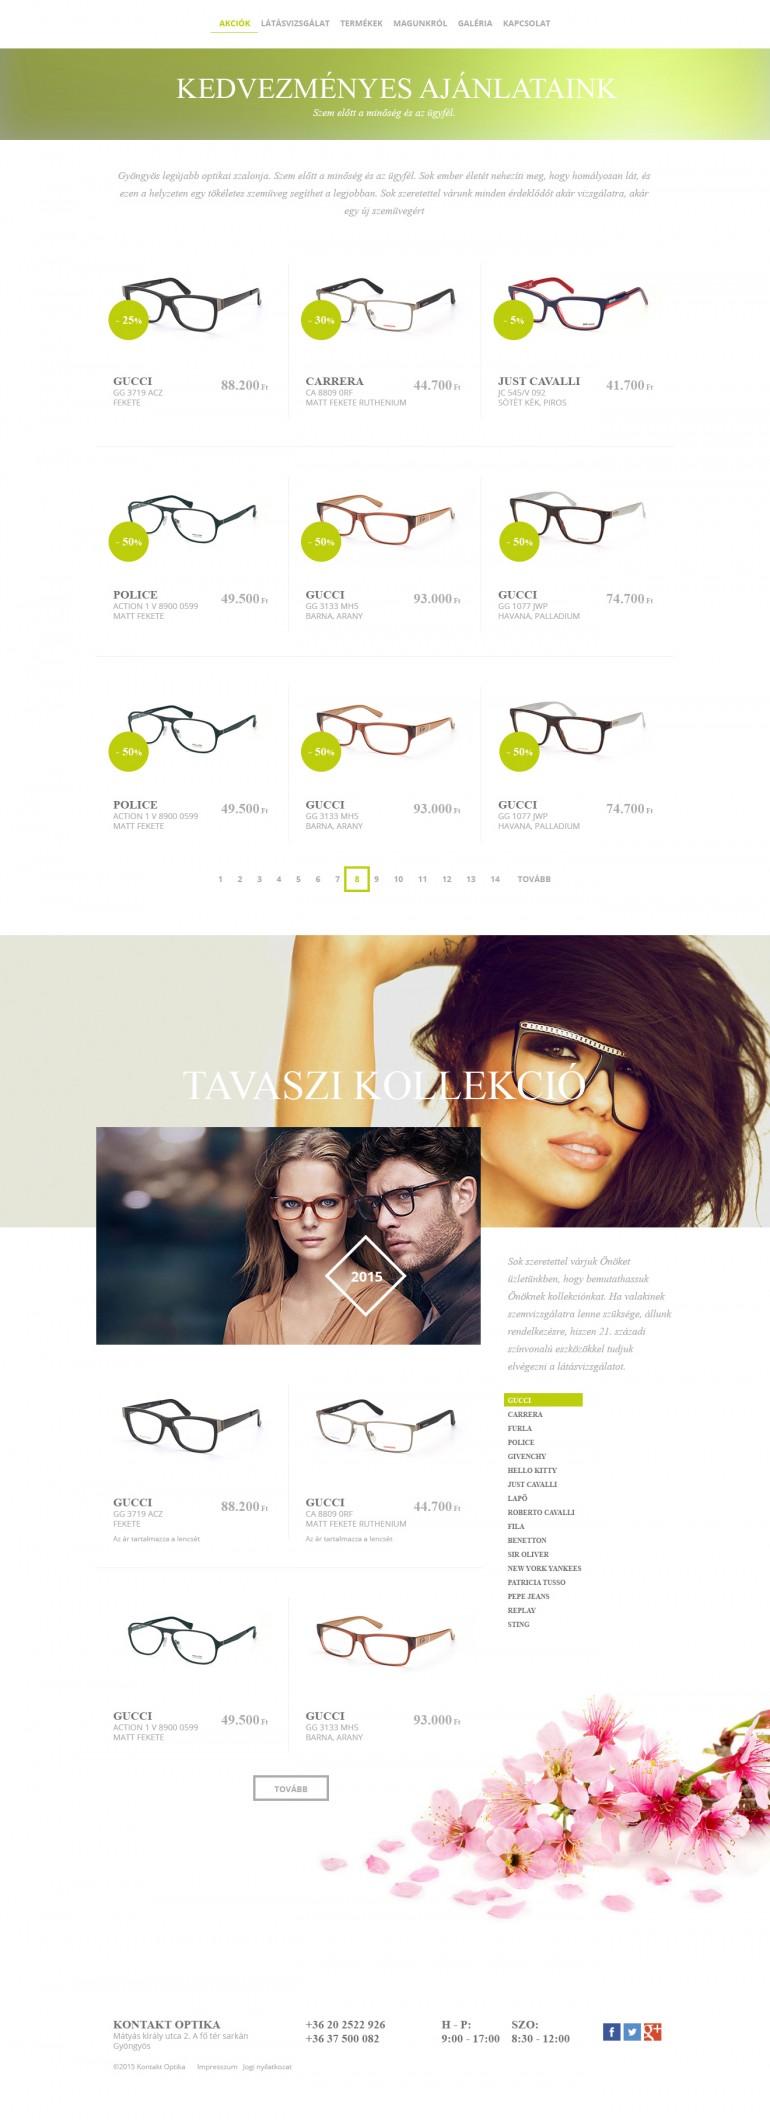 Kontakt Optika. Luxury fashion eyeware. Design concept.  More on Béhance: http://bit.ly/145wX3O